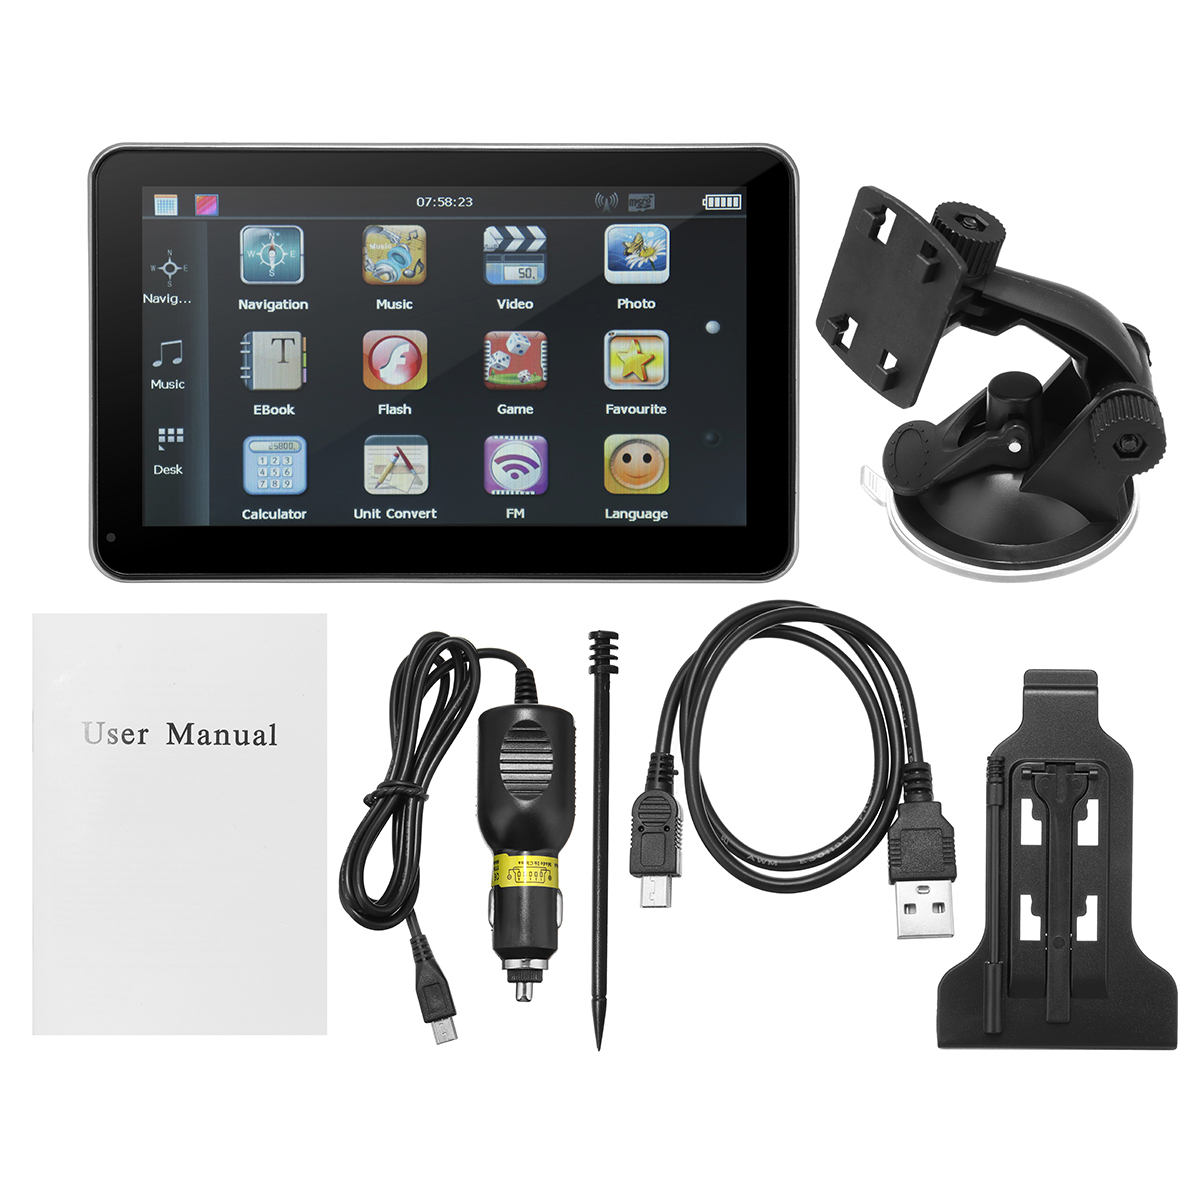 KROAK A Set 7 Inch Screen Car Auto GPS Navigation USB Port MMC Slot Rechargeable E-book Video Audio FM Mp3 Player a gauge 7 inch lcd at070tn94 highlight navigation screen screen